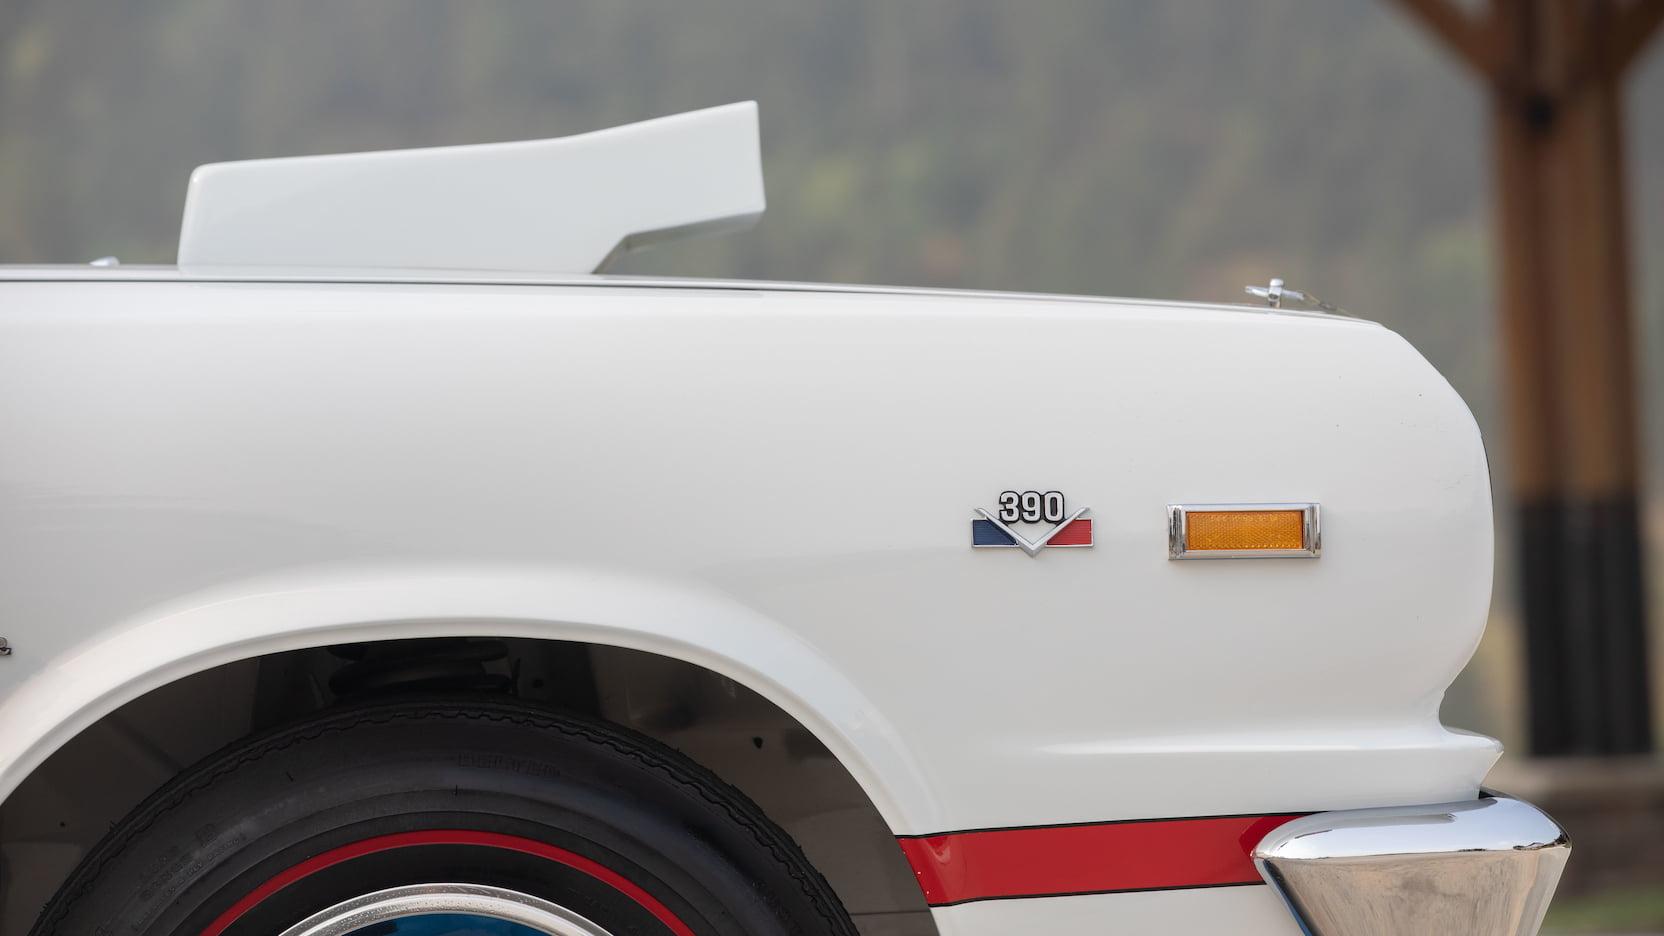 1969 AMC Hurst SC/Rambler front quarter panel